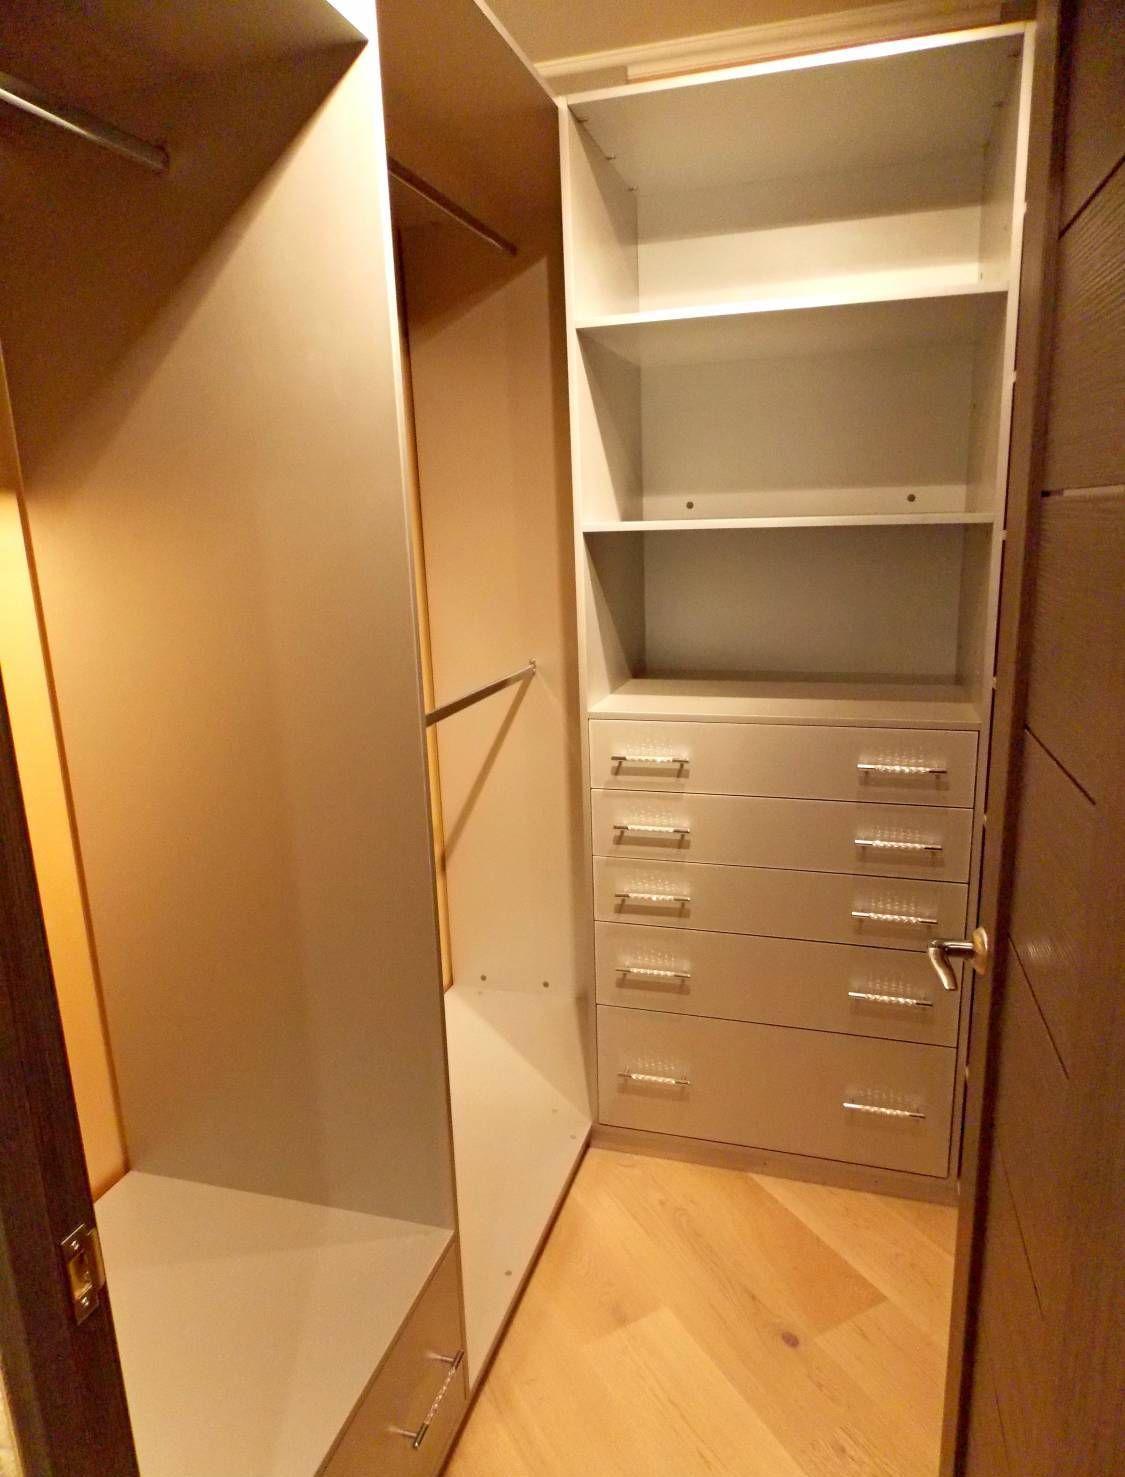 вход в спальню через гардеробную